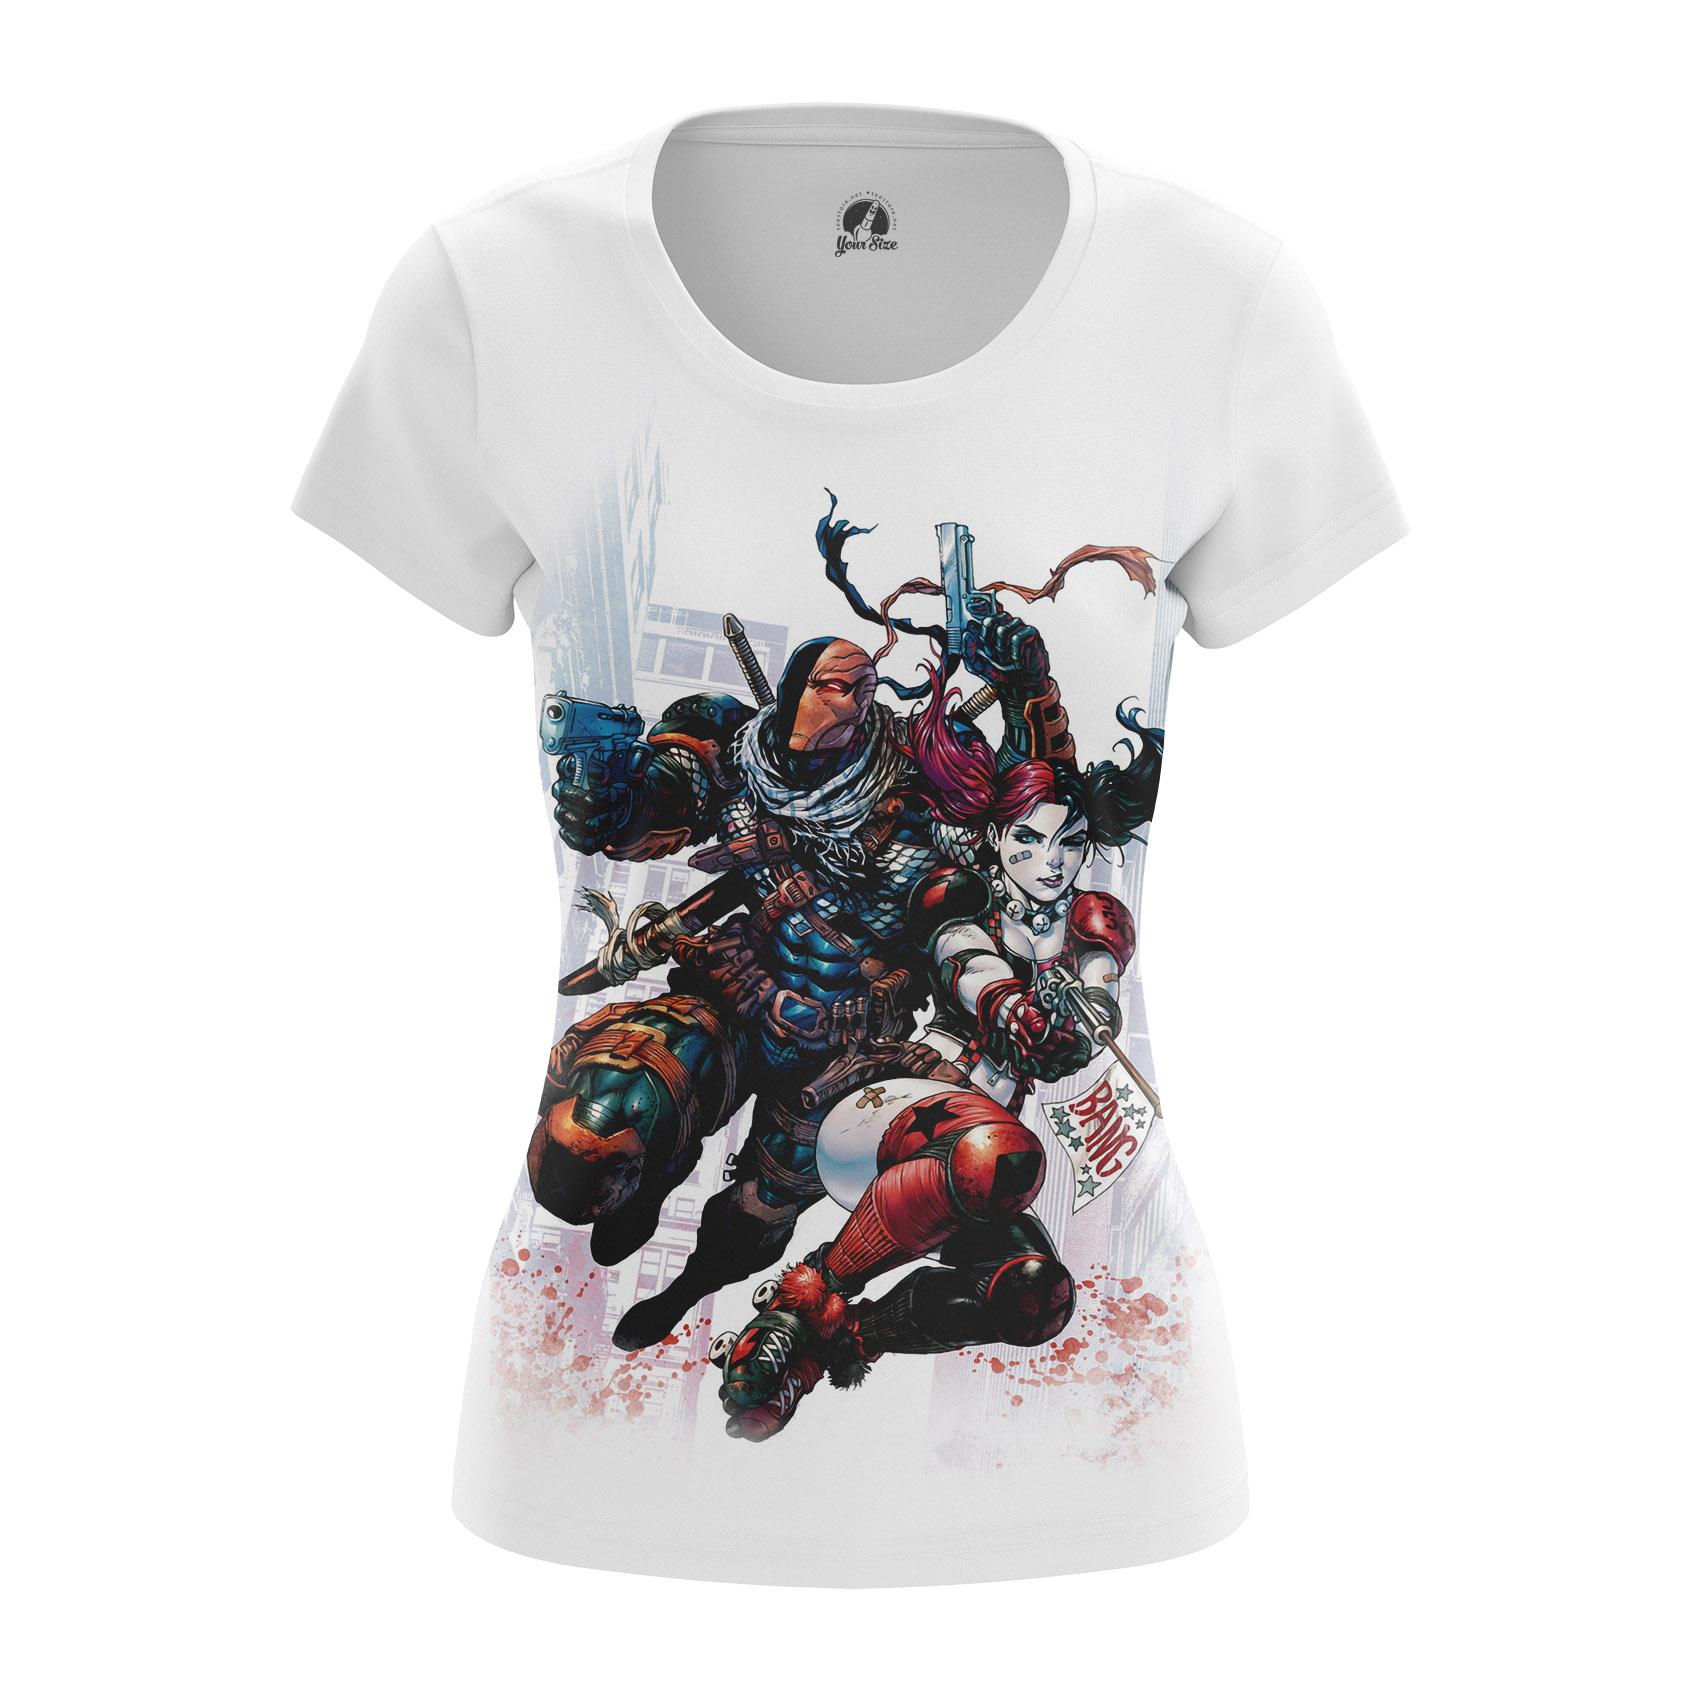 Merchandise - Women'S T-Shirt Deathstroke And Harley